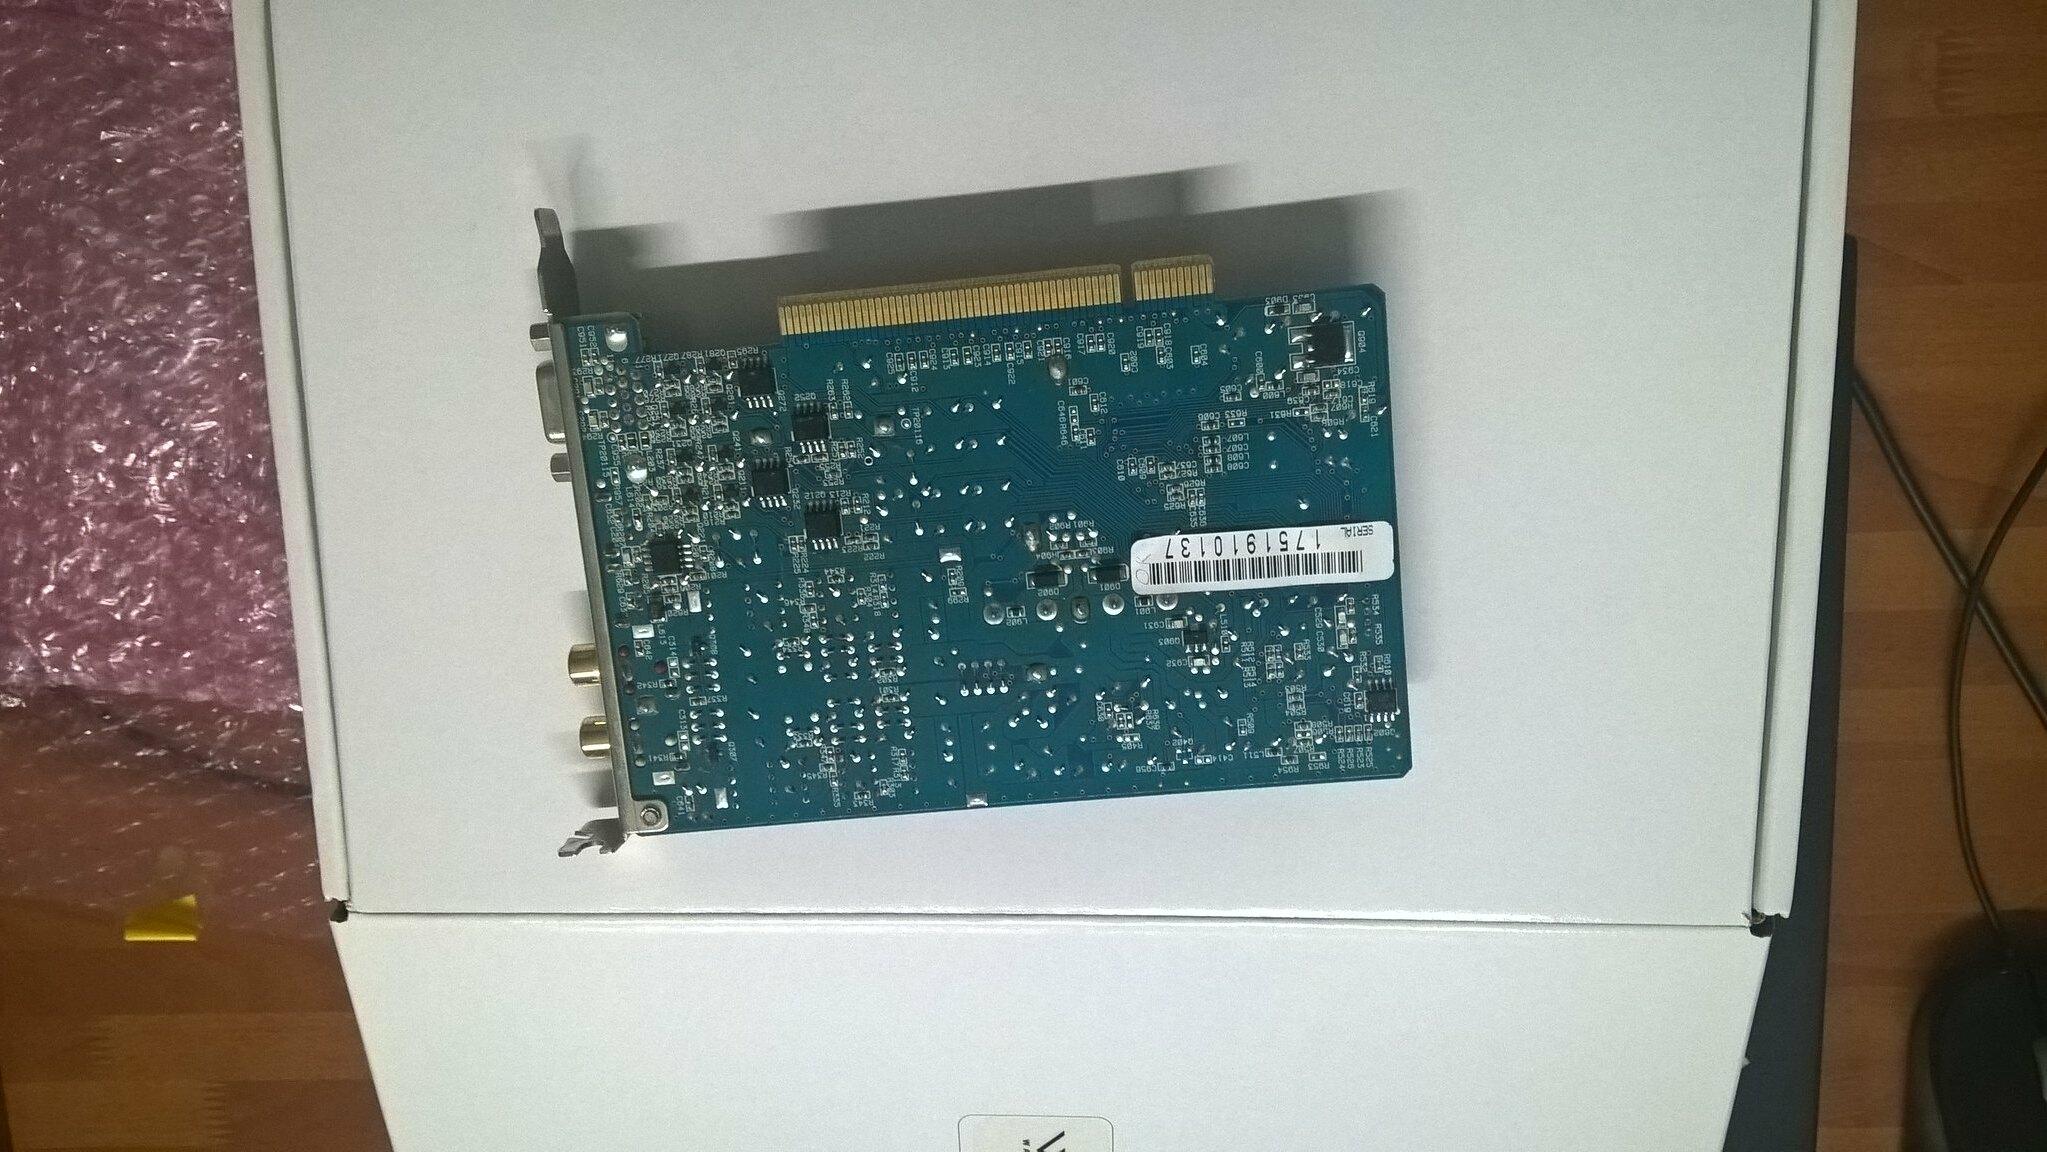 Onkyo từ Japan - U55SX, U55SX2, 200PCI LTD, 200PCI, 150PCI, 90PCI - 9